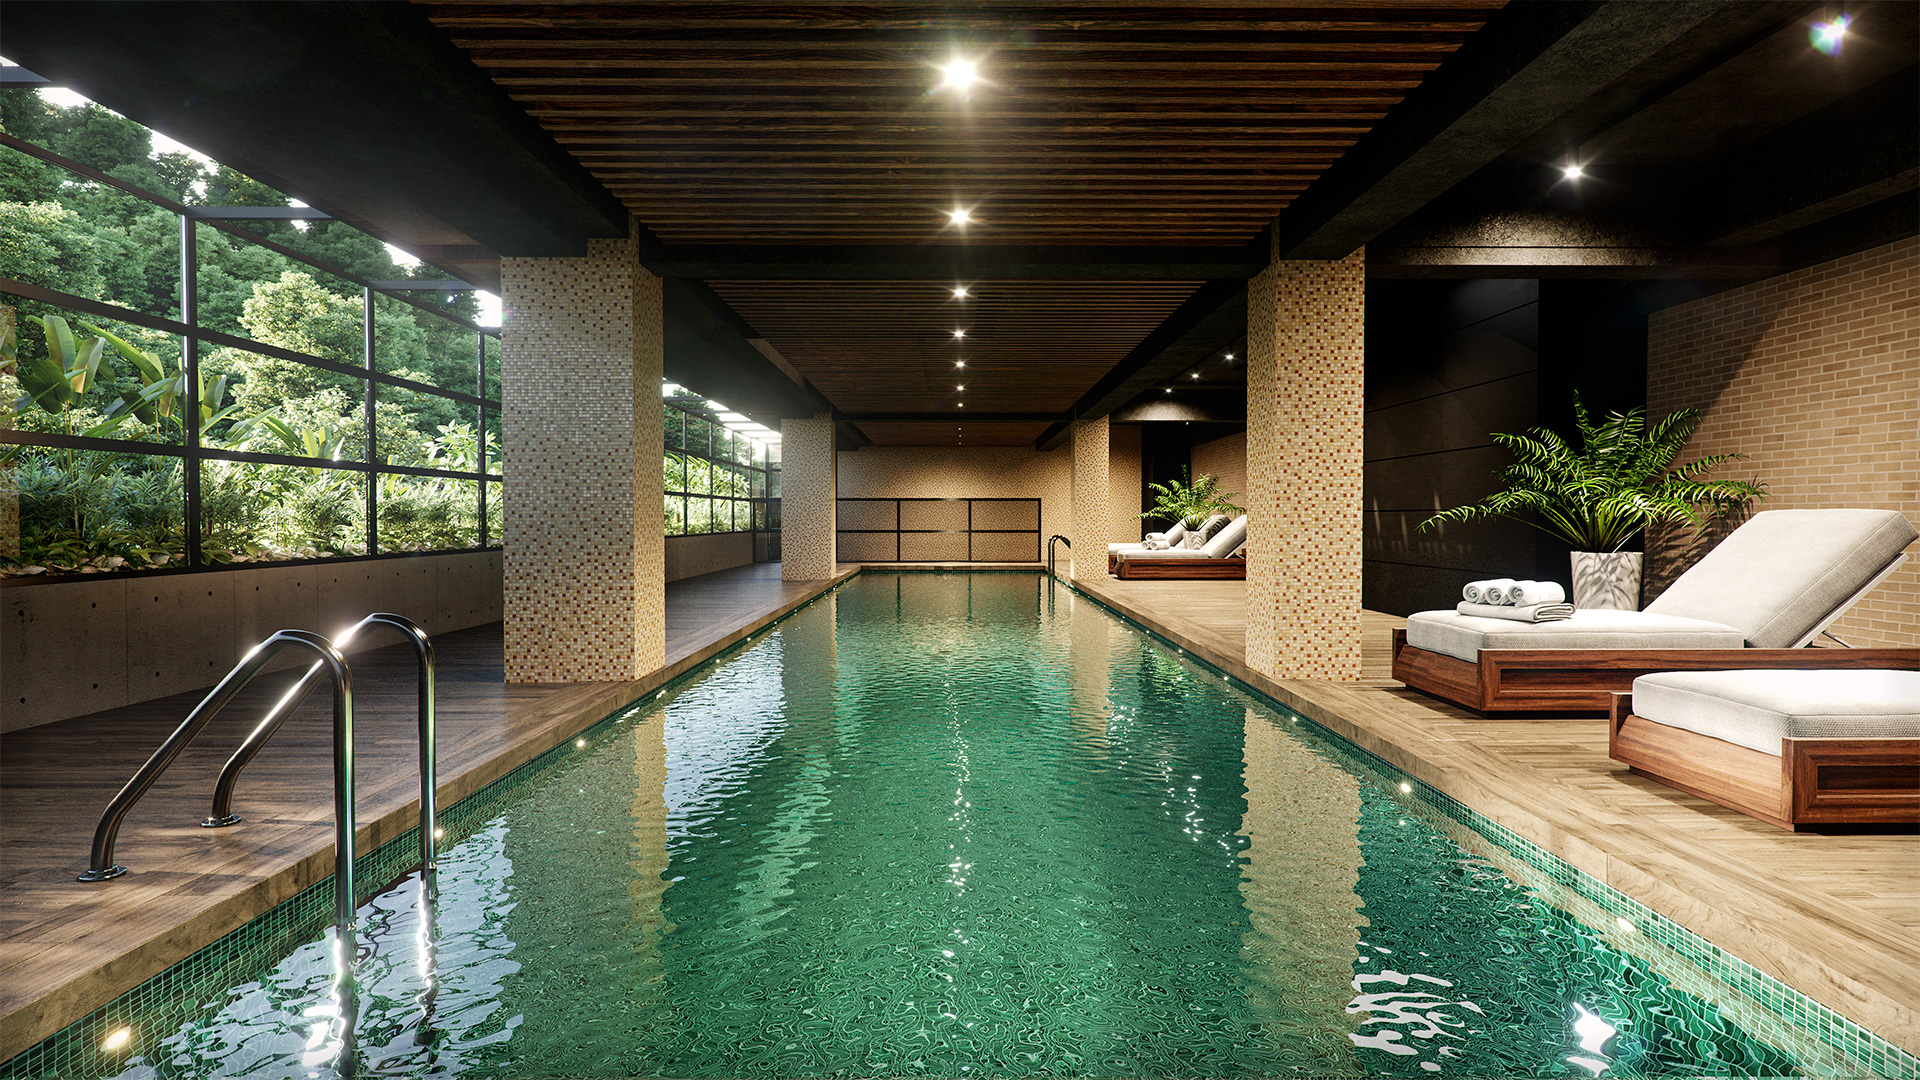 piscina-rinterna-CORREGIDA-WEB